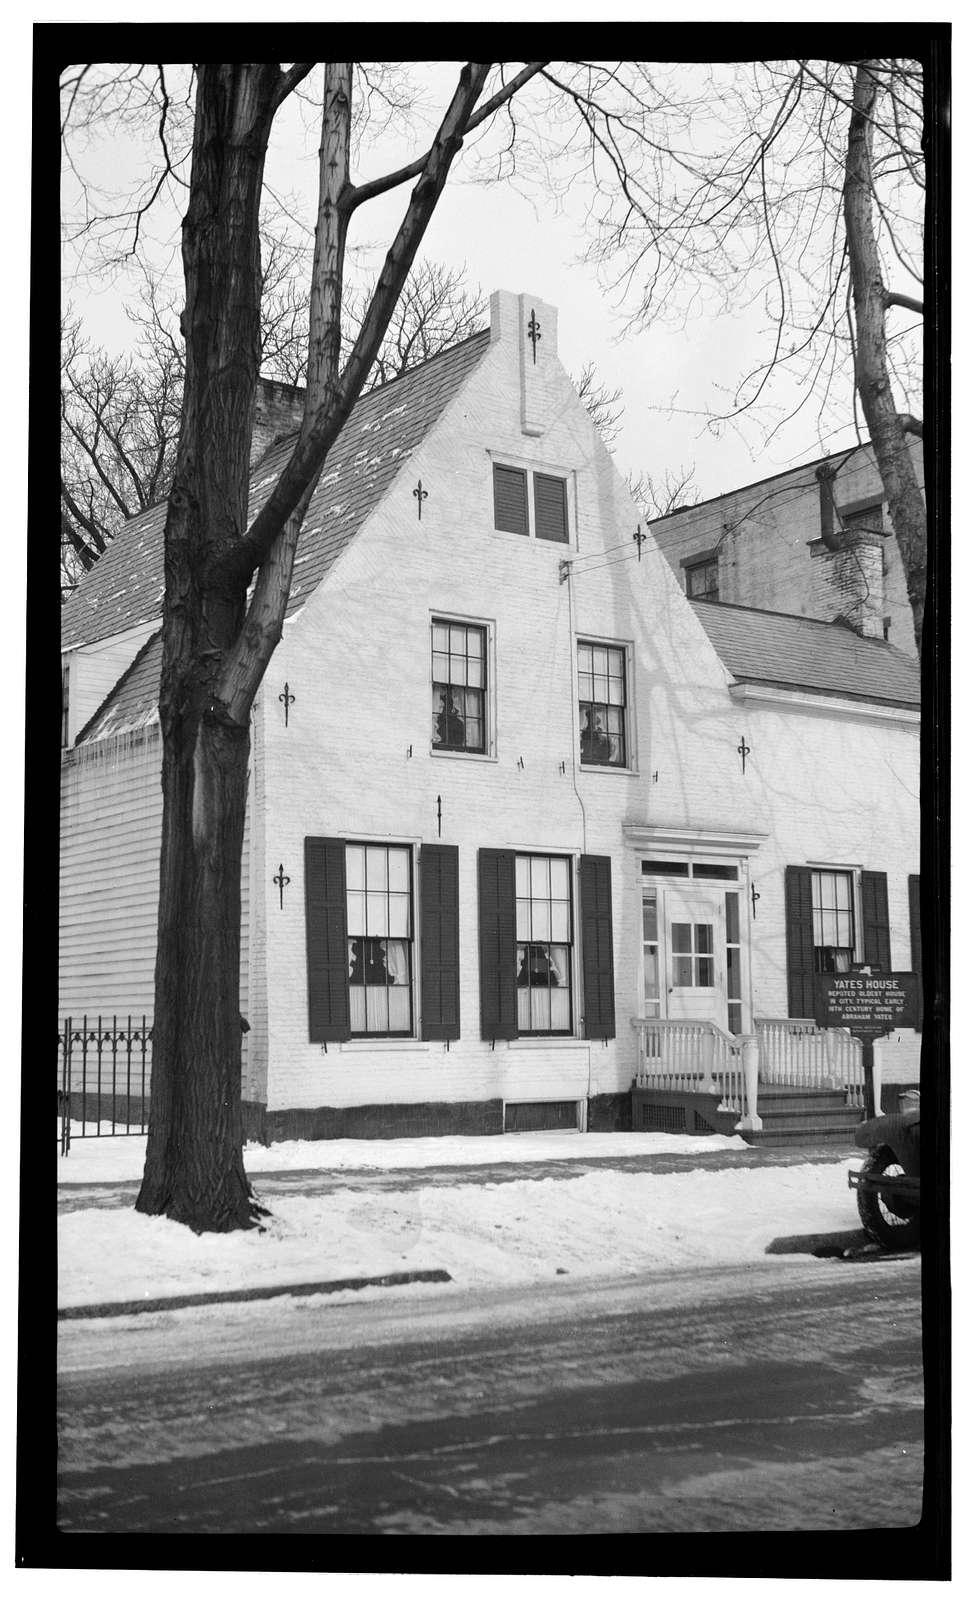 Abraham Yates House, 109 Union Street, Schenectady, Schenectady County, NY